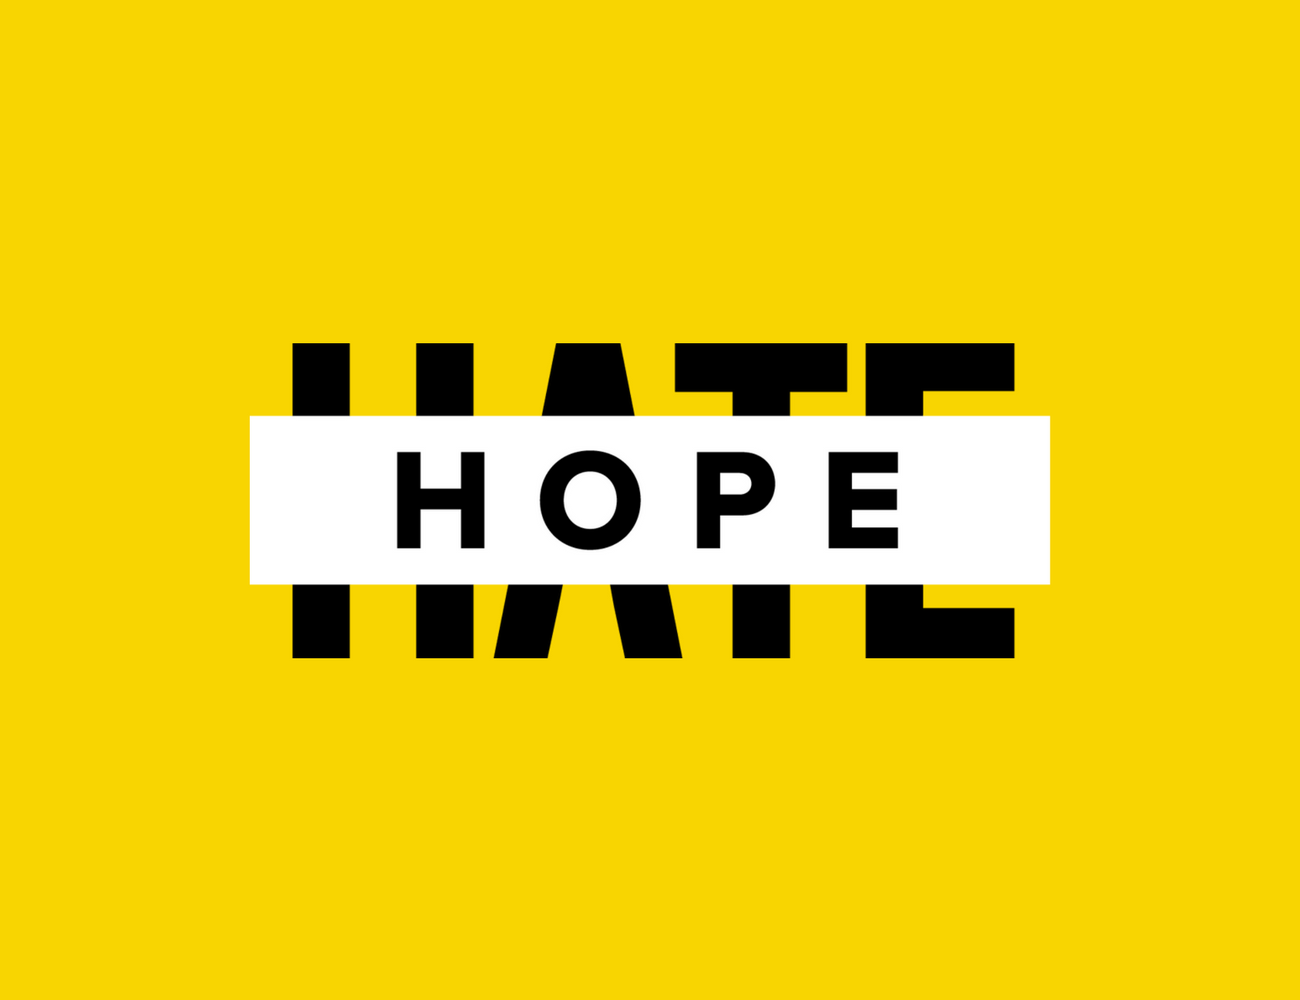 https://hopenothate.com/